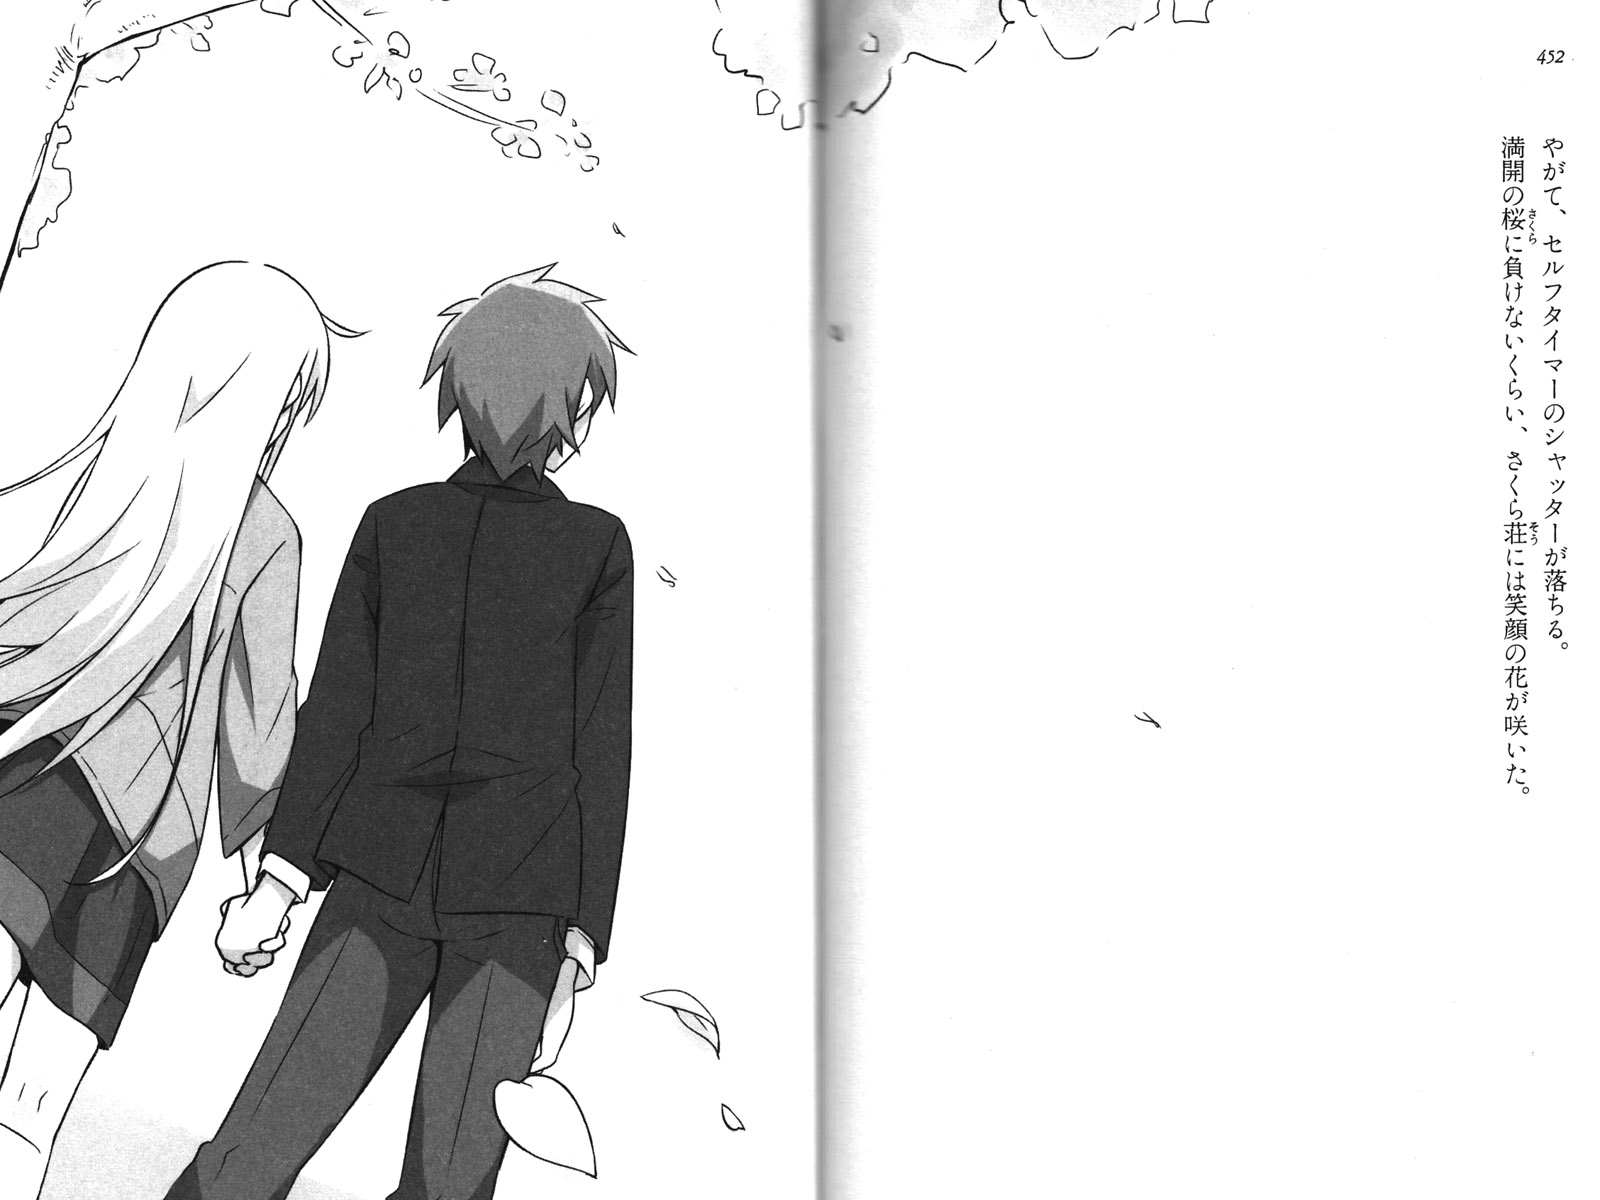 Sakura no pet na kanojo online dating